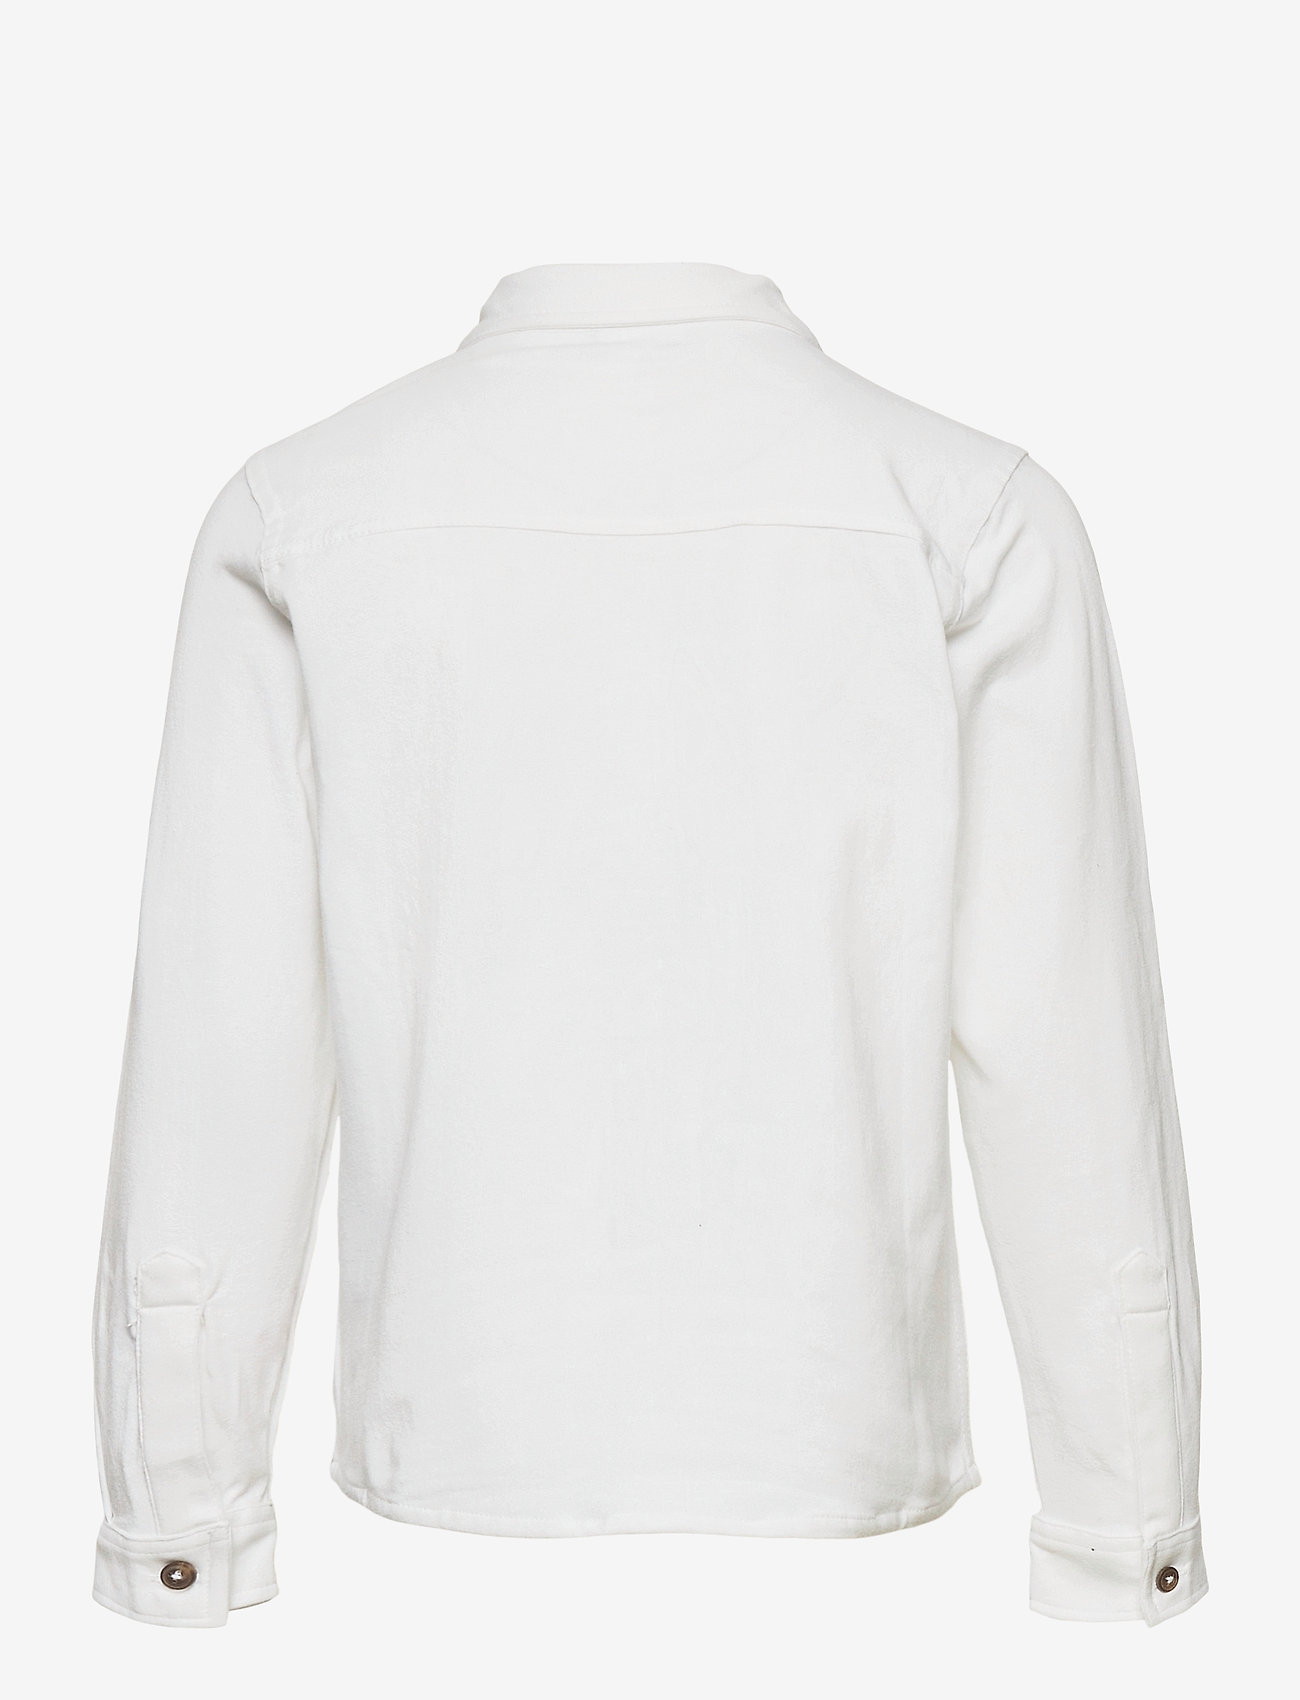 Hust & Claire - Rasmus - Shirt - shirts - white - 1